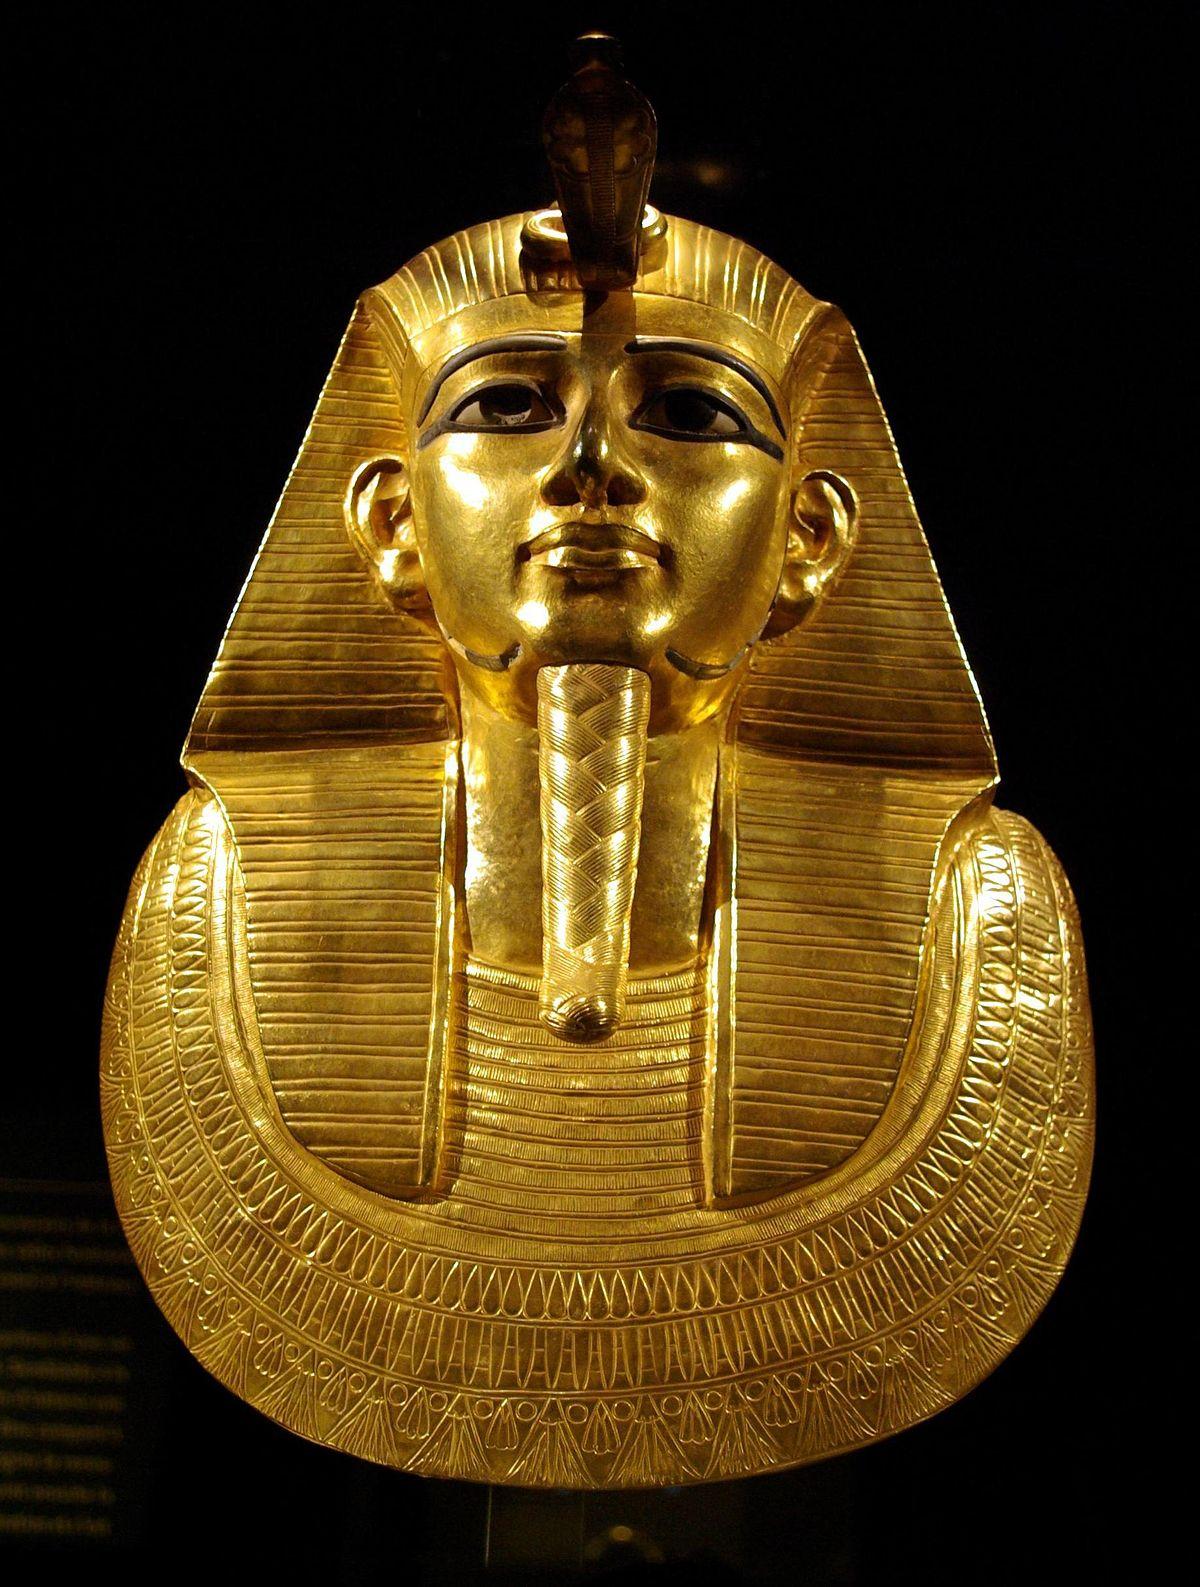 1200px-Psusennes_I_mask_by_Rafaèle.jpg